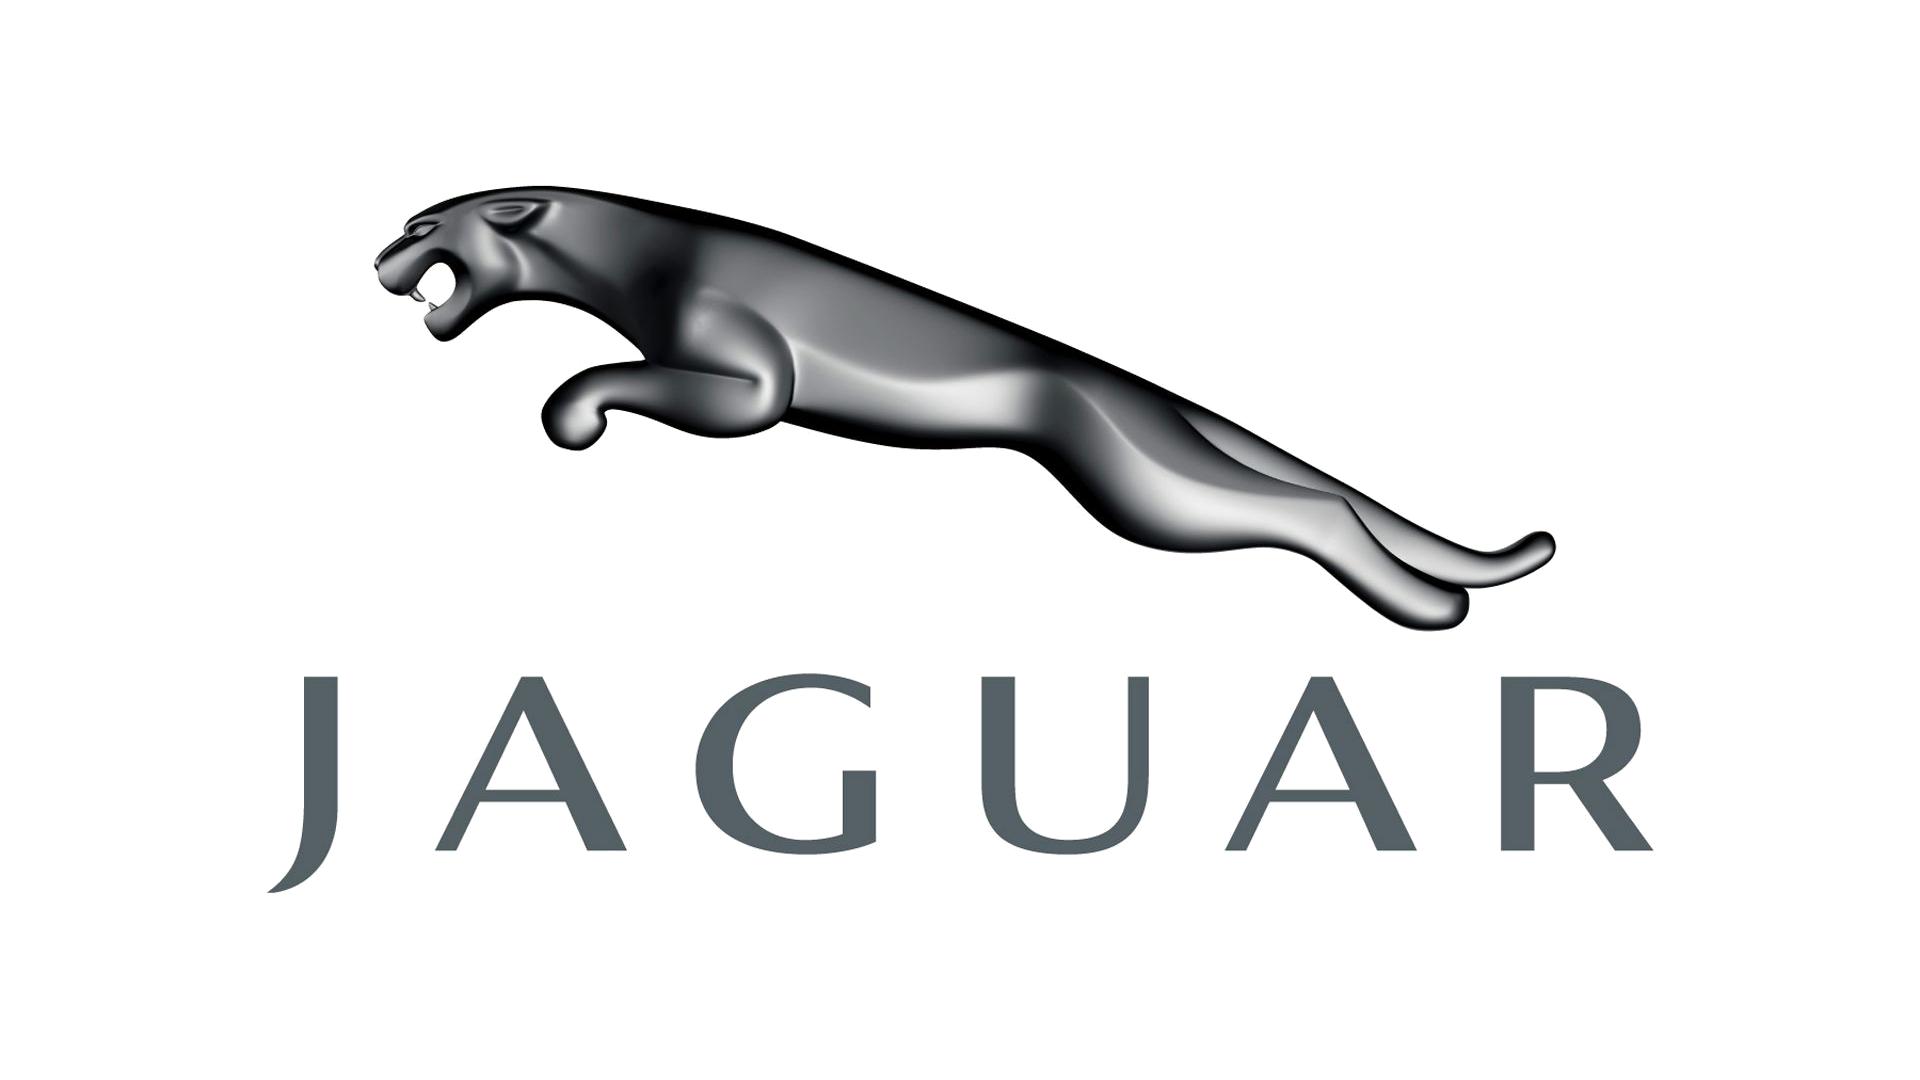 https://evcukgroup.com/wp-content/uploads/2020/06/Jaguar-emblem-1920x1080-1.png